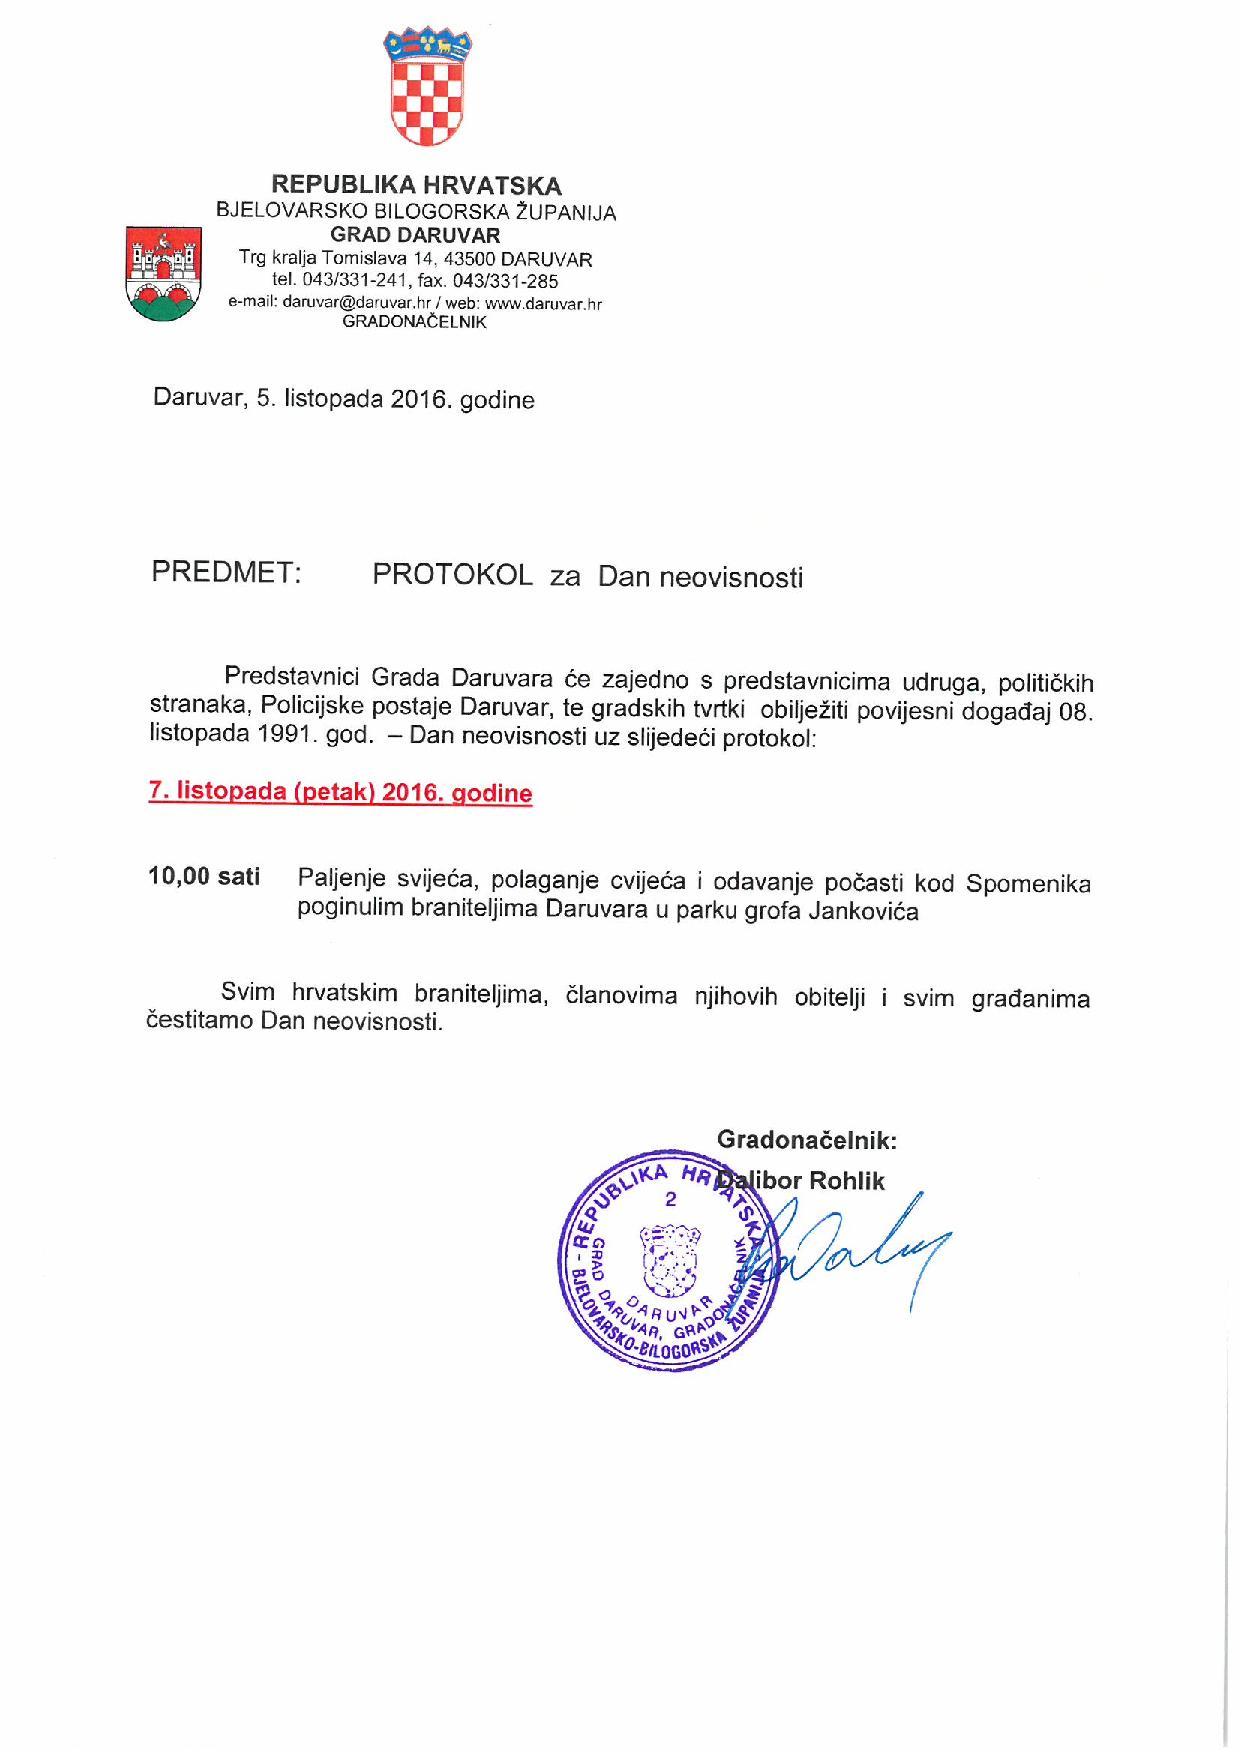 sgrad_daruv16100507020-page-001